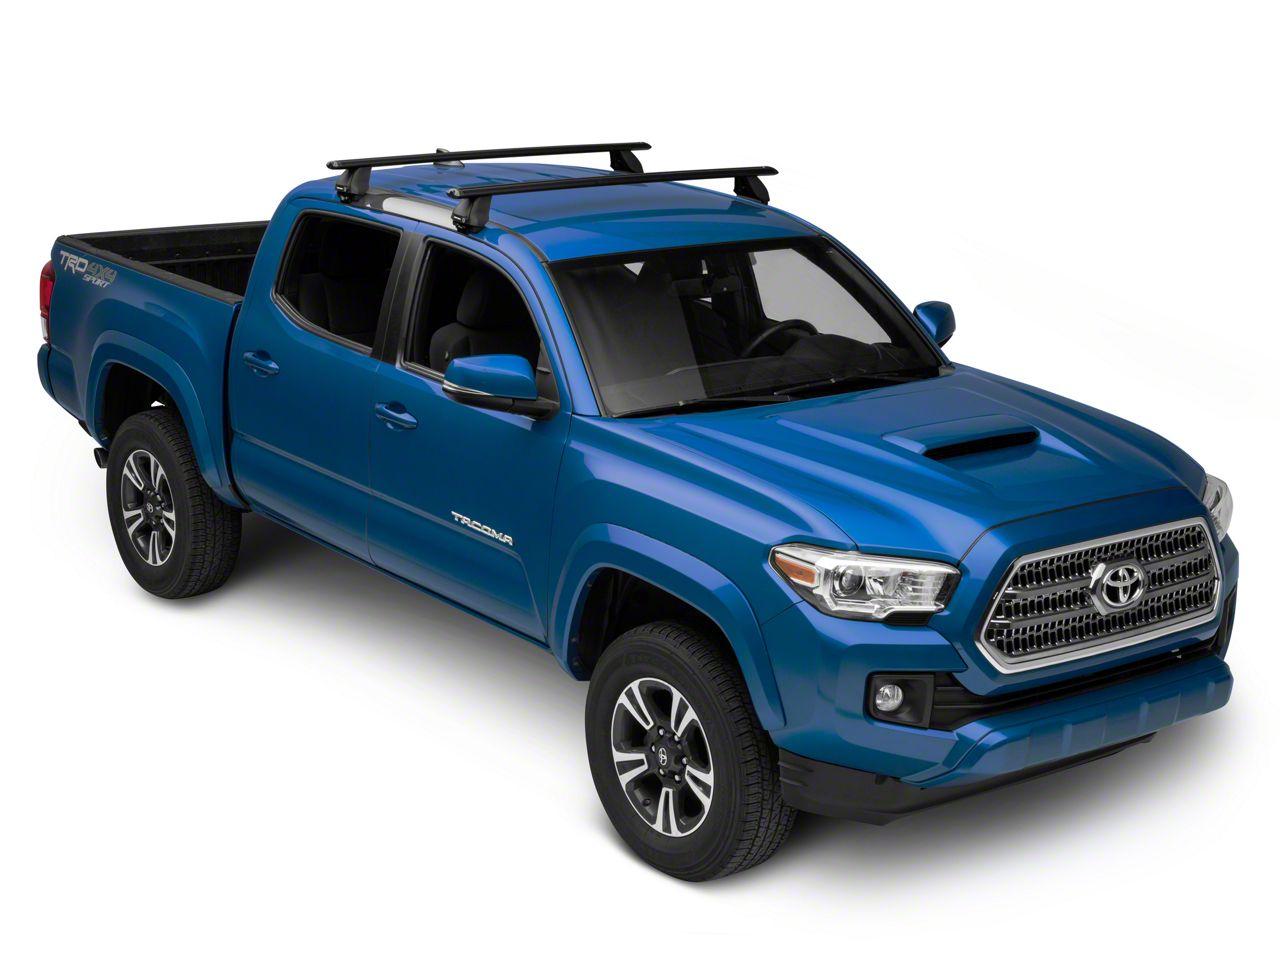 Rhino-Rack Vortex 2500 2-Bar Roof Rack - Black (05-19 Tacoma Double Cab)